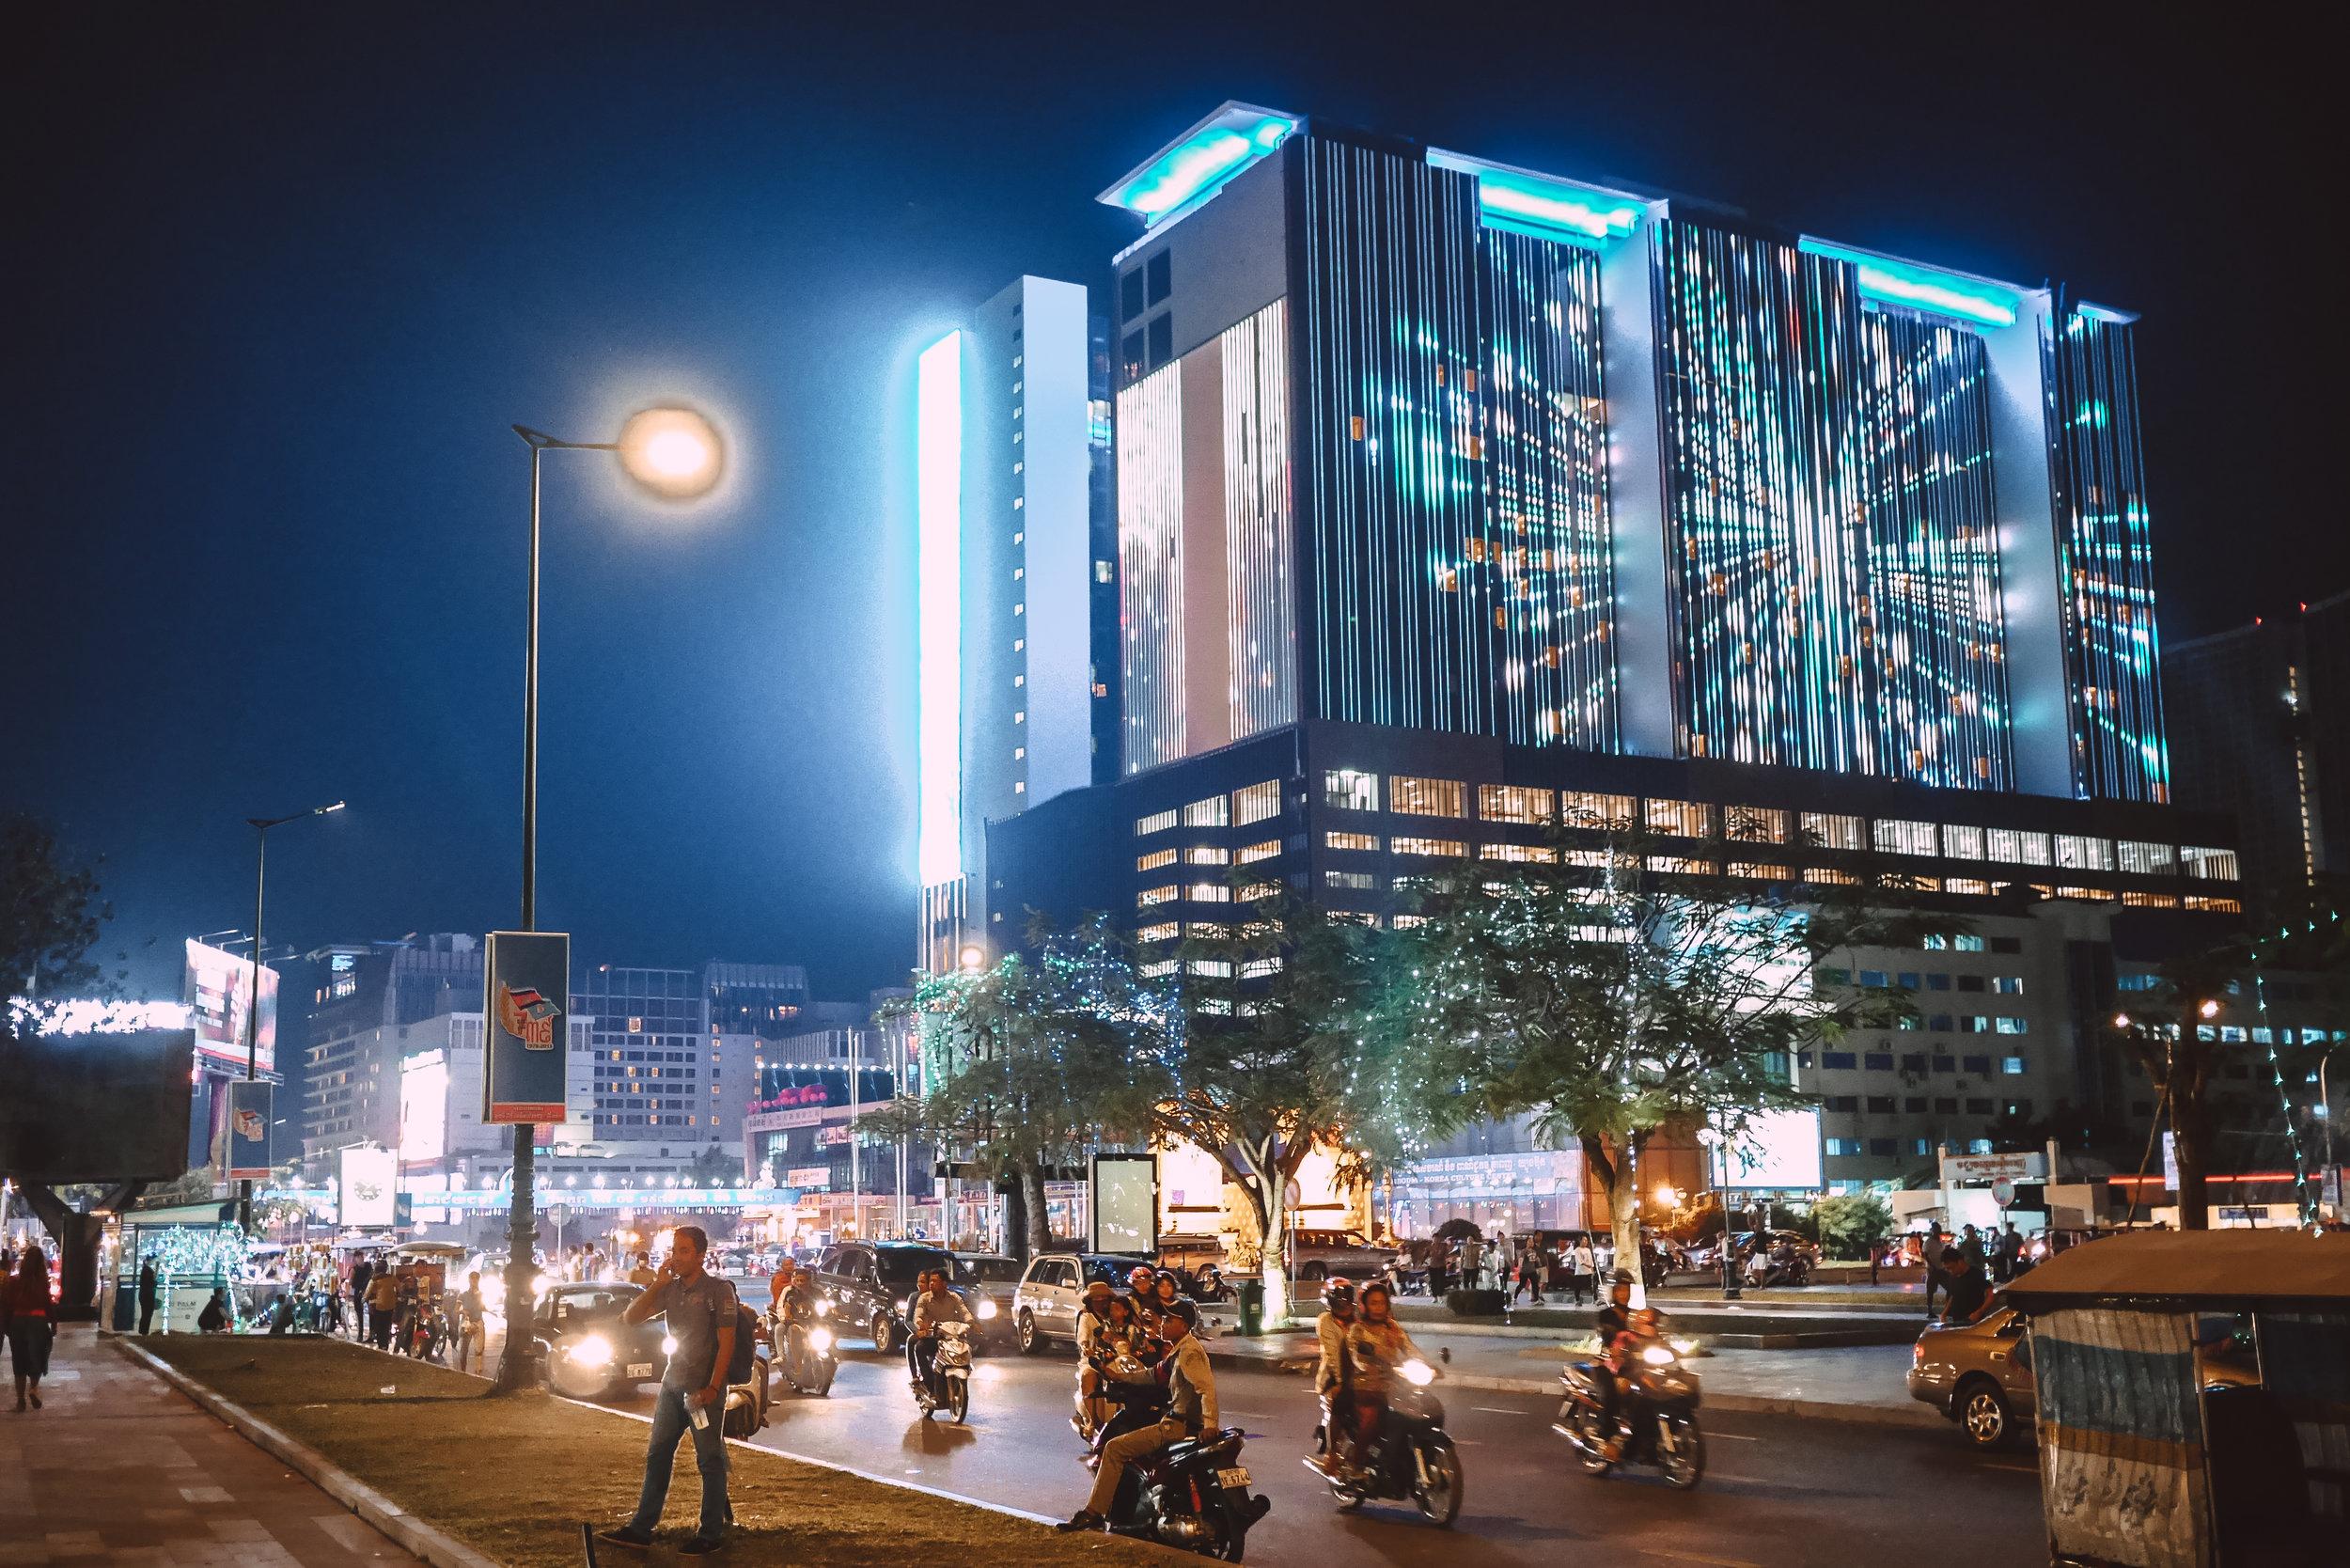 visiter-la-ville-de-phnom-penh-thecheerfulist